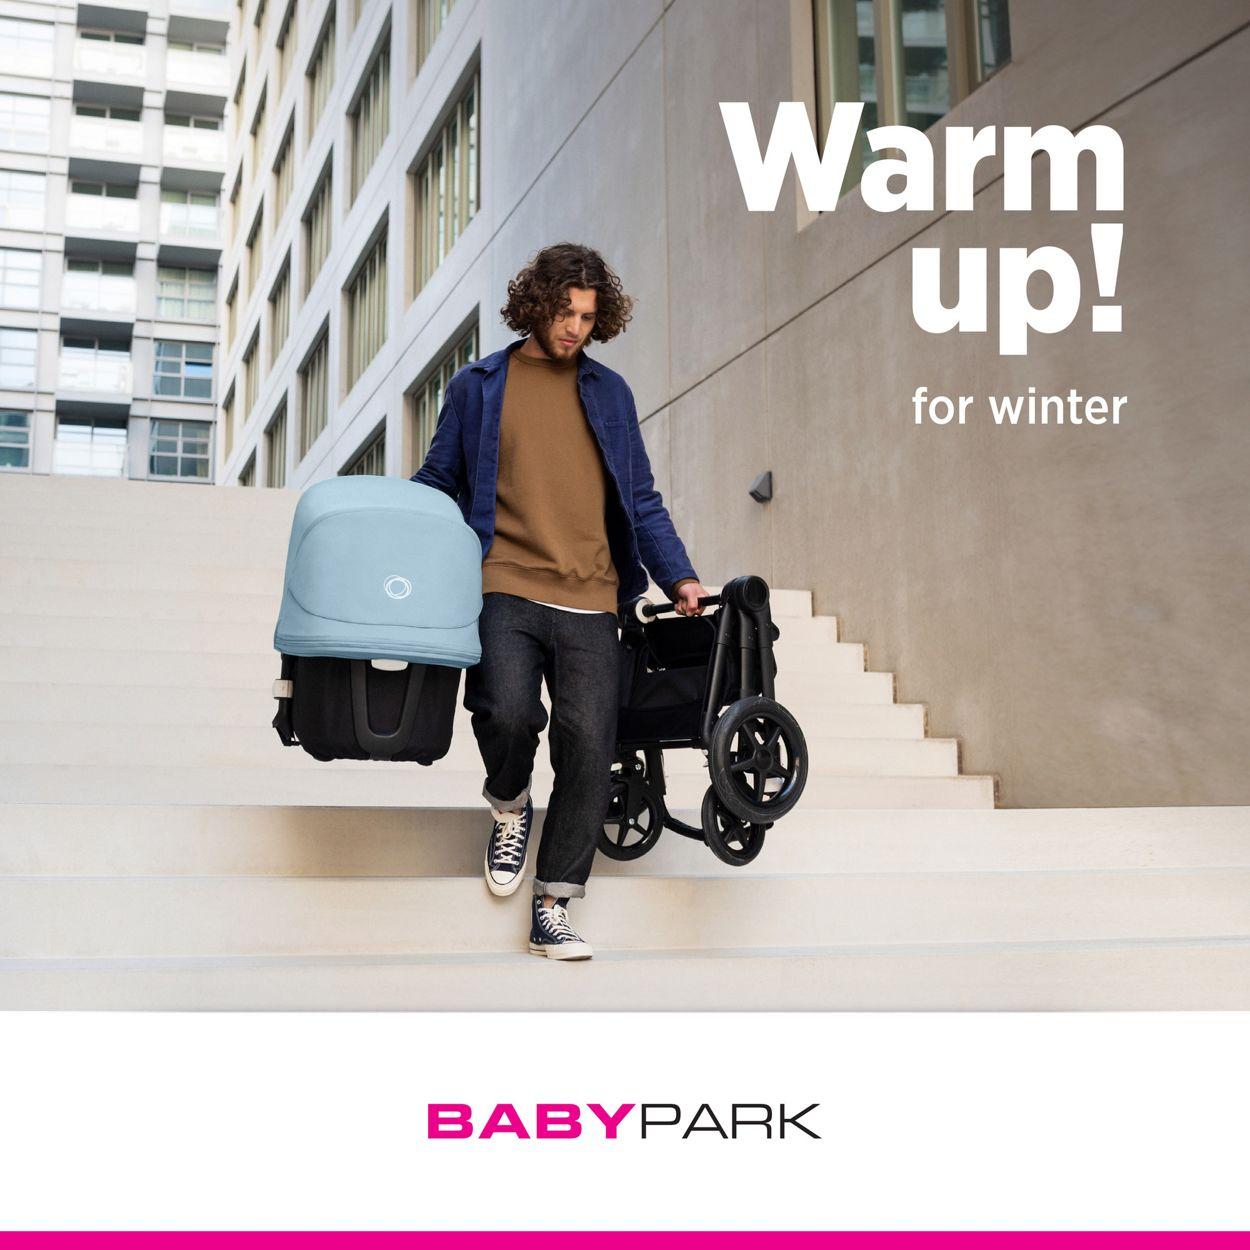 Catalogus van Babypark van 16.11.2020